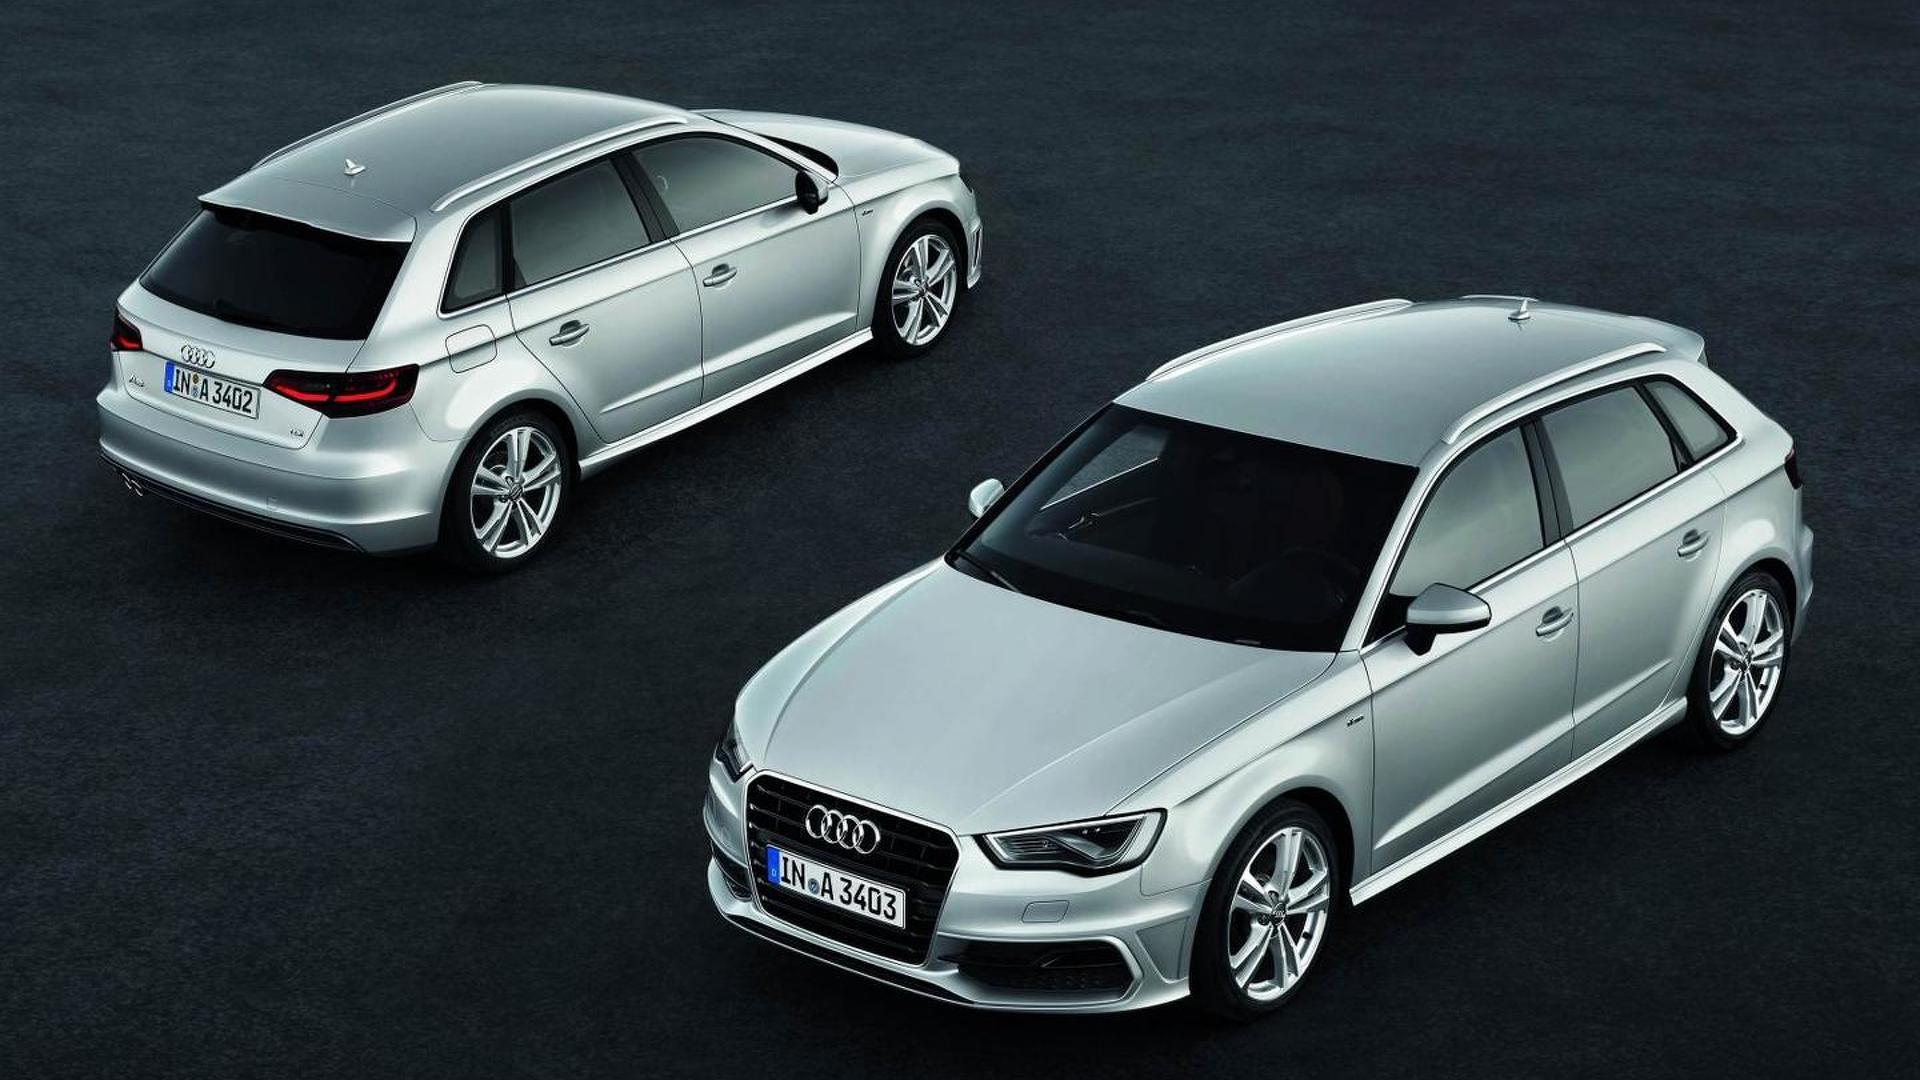 Kelebihan Audi A3 Sportback 2013 Tangguh